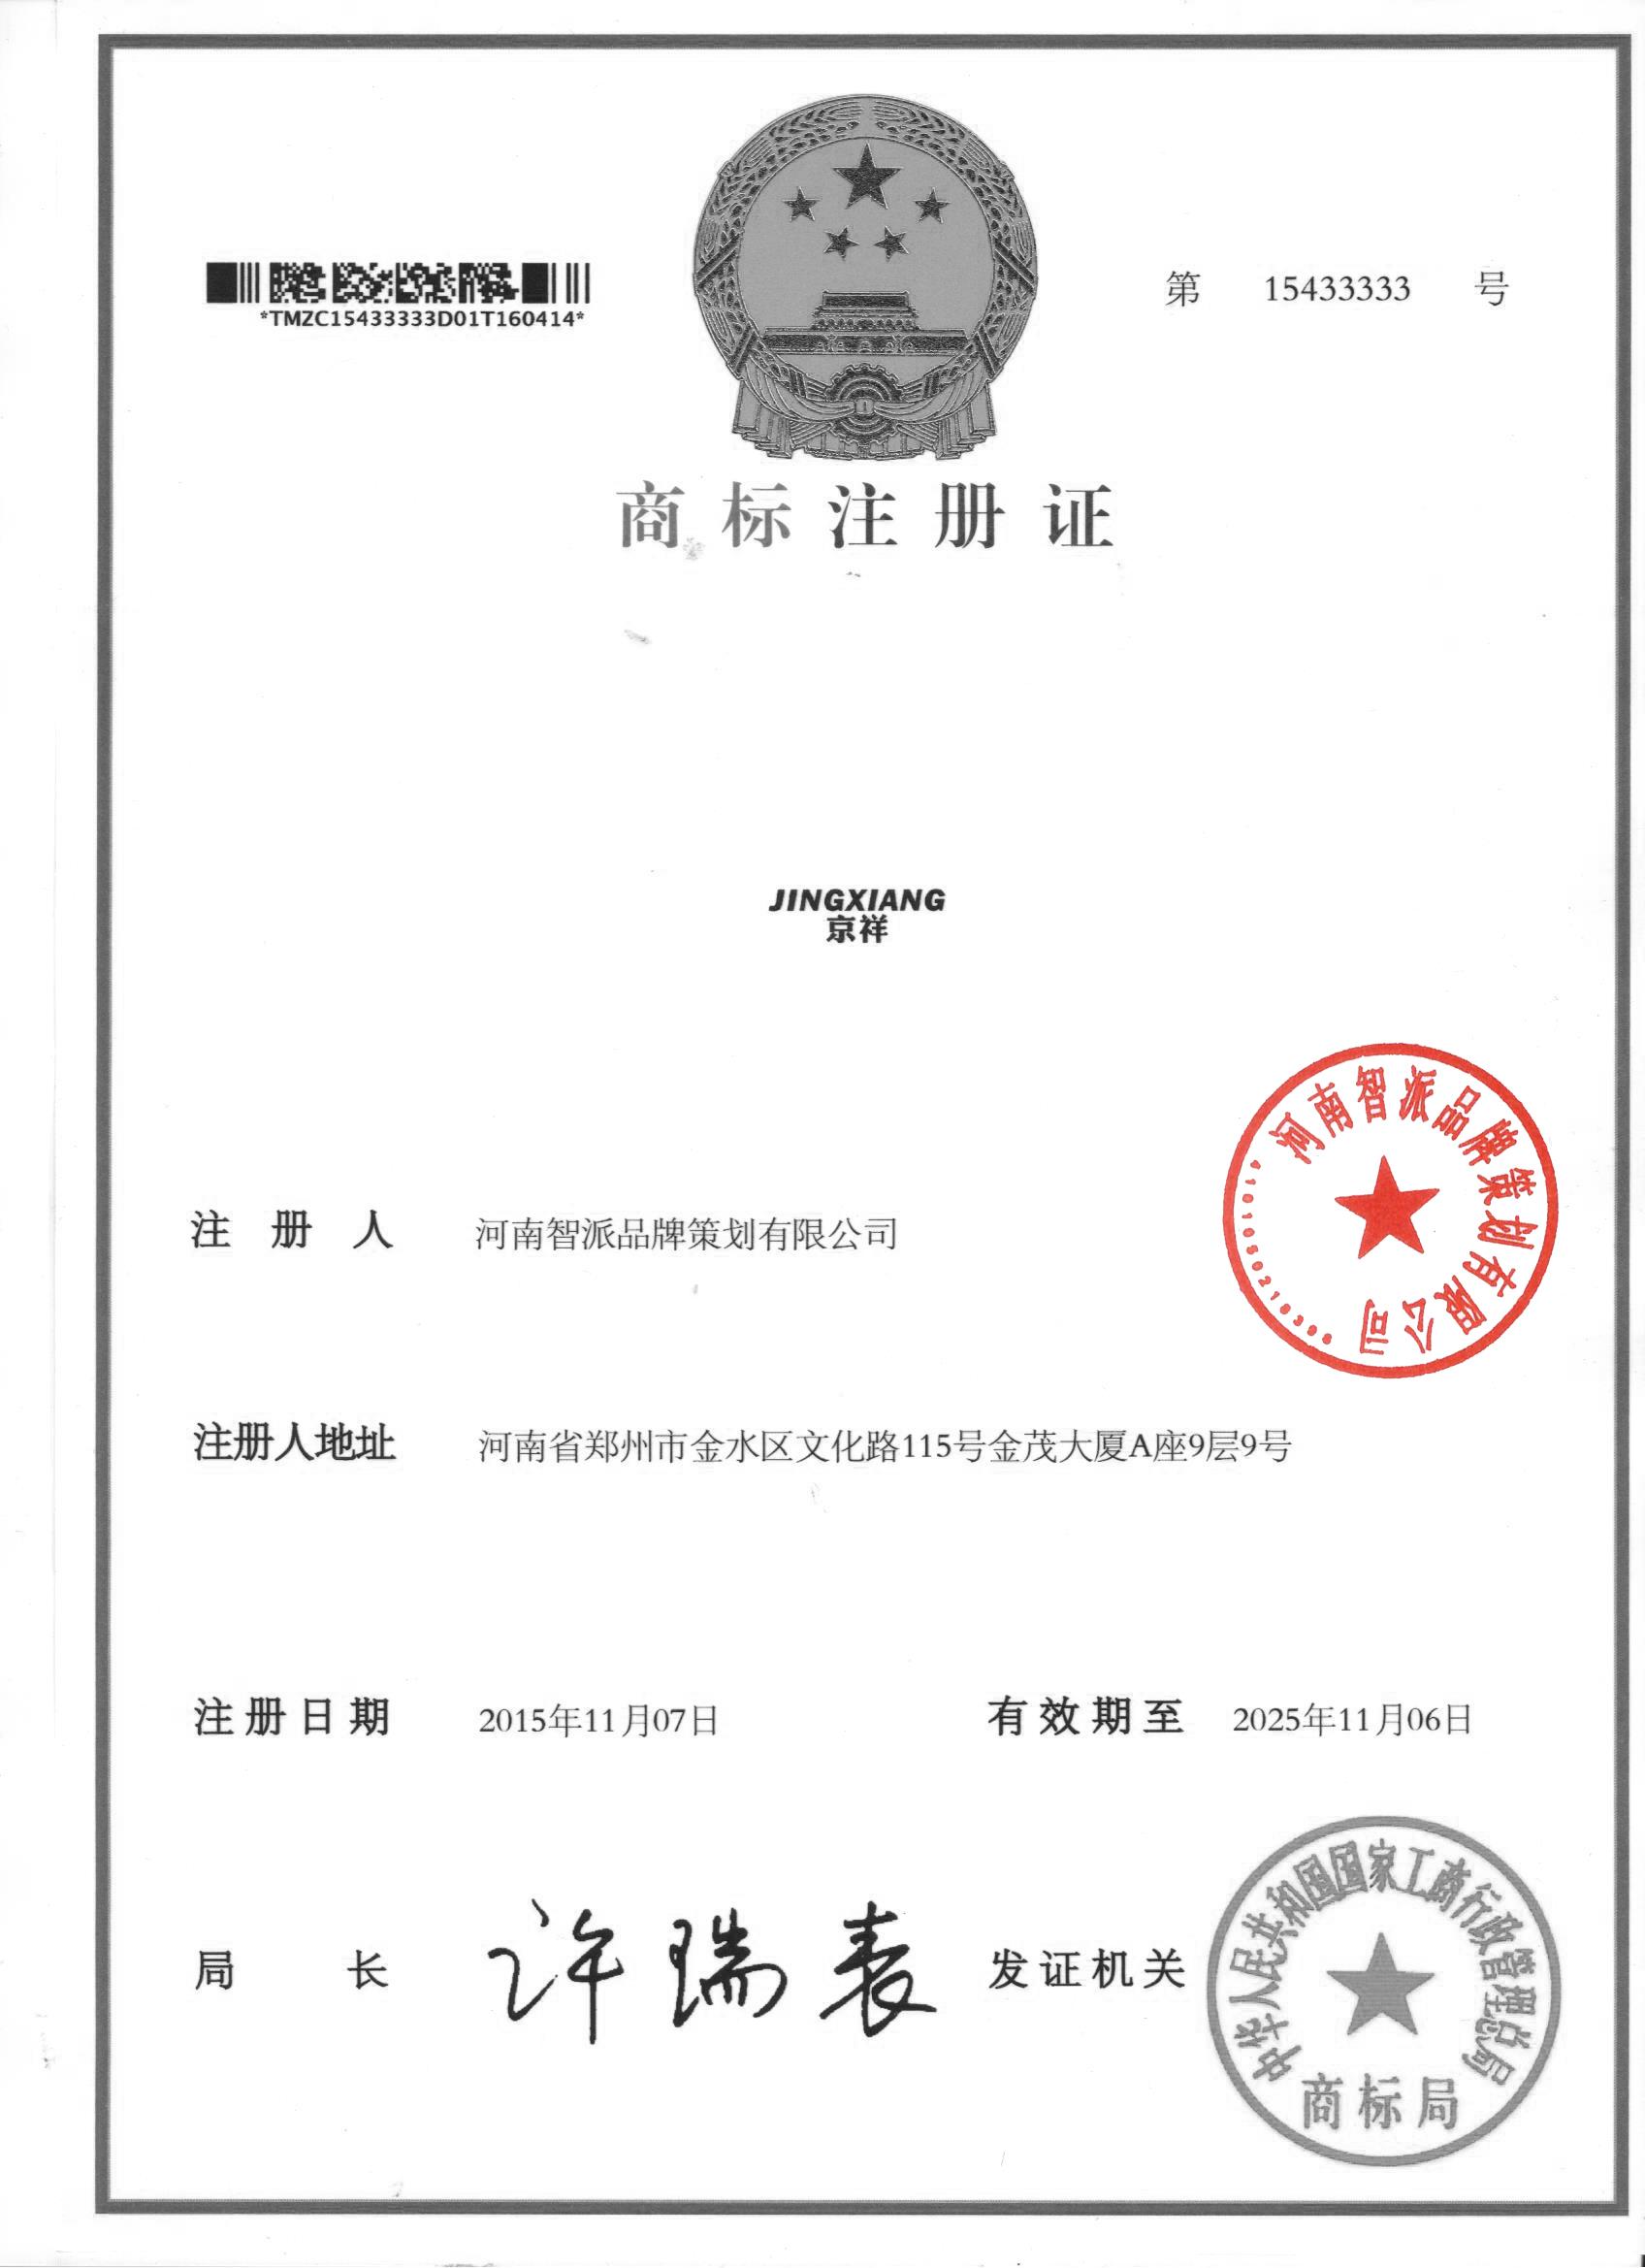 京祥(jingxiang)